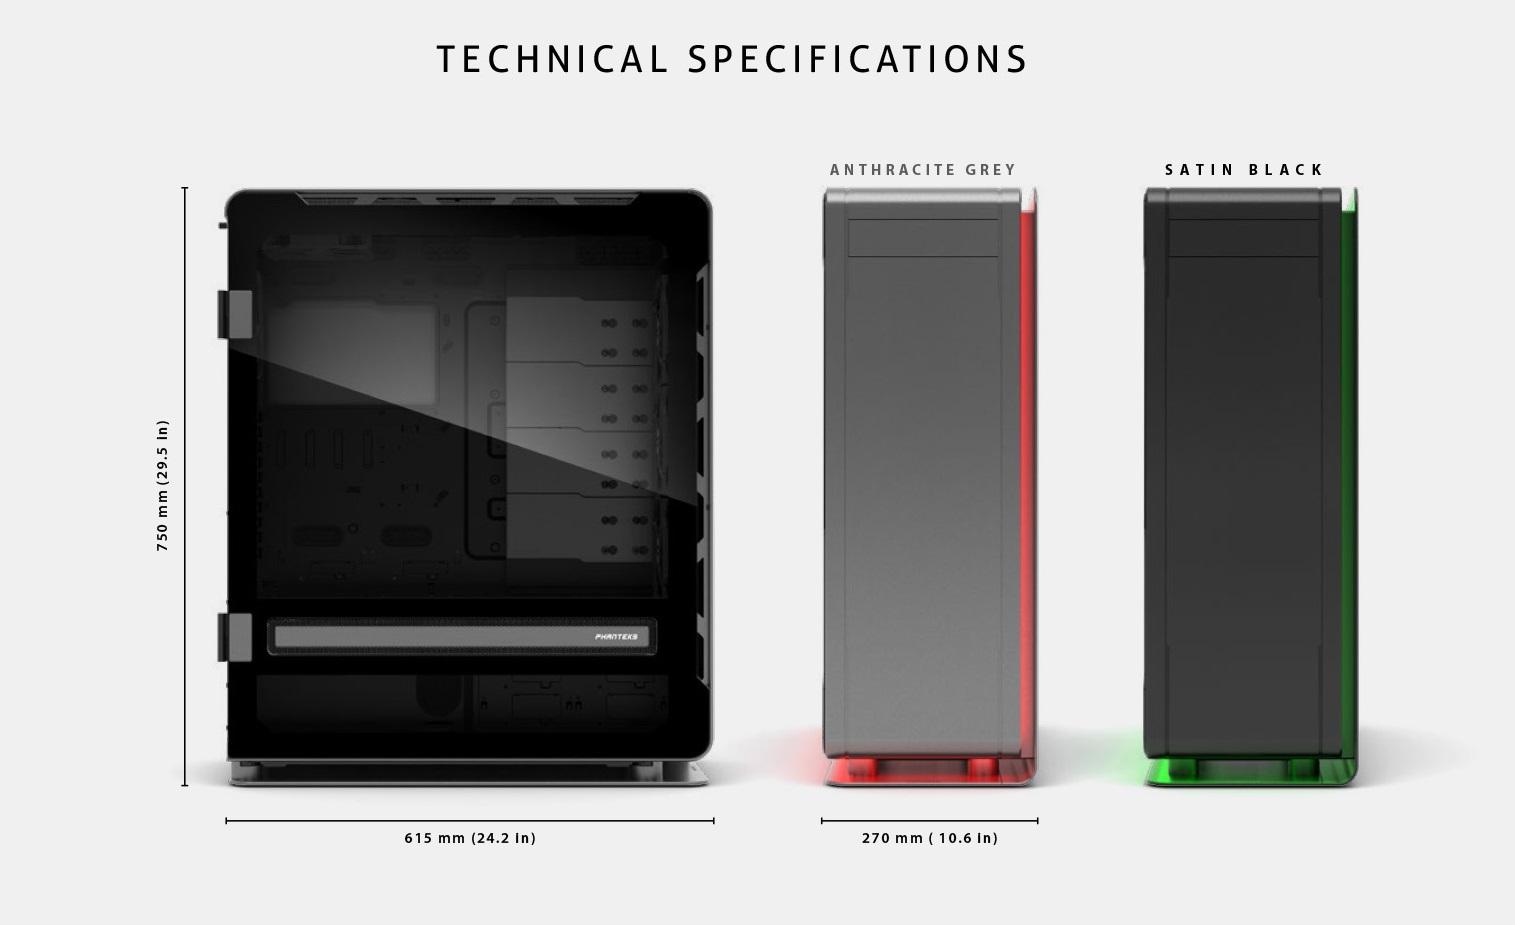 Phanteks Enthoo Elite Extreme RGB Lighting, Tempered Glass Window, Dual System Support giải pháp tản nhiệt đỉnh cao